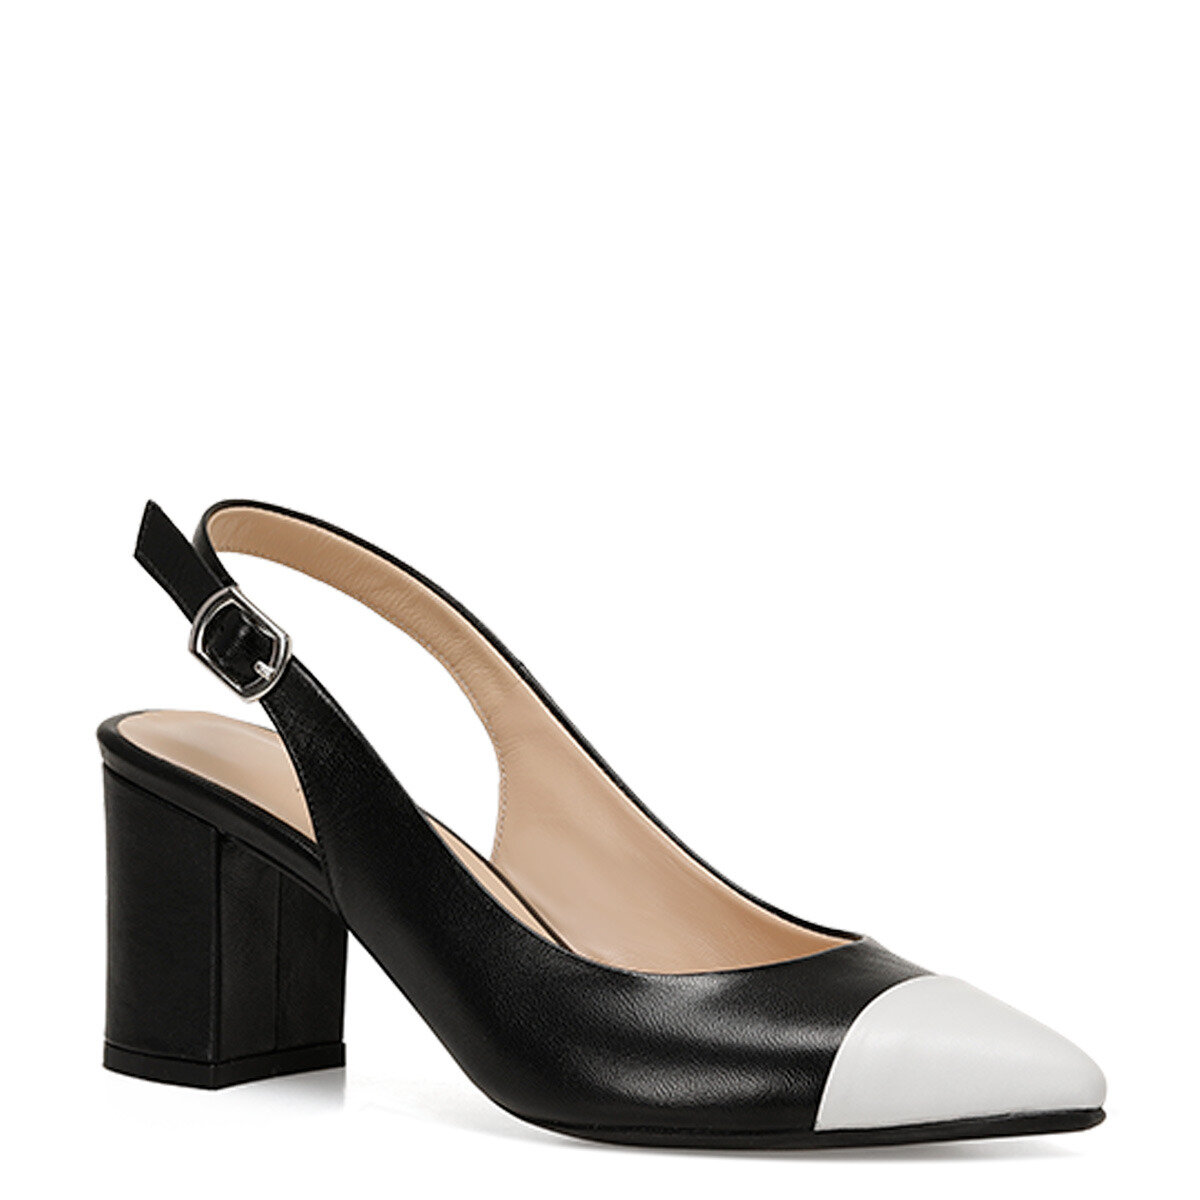 LISA Siyah Kadın Topuklu Ayakkabı